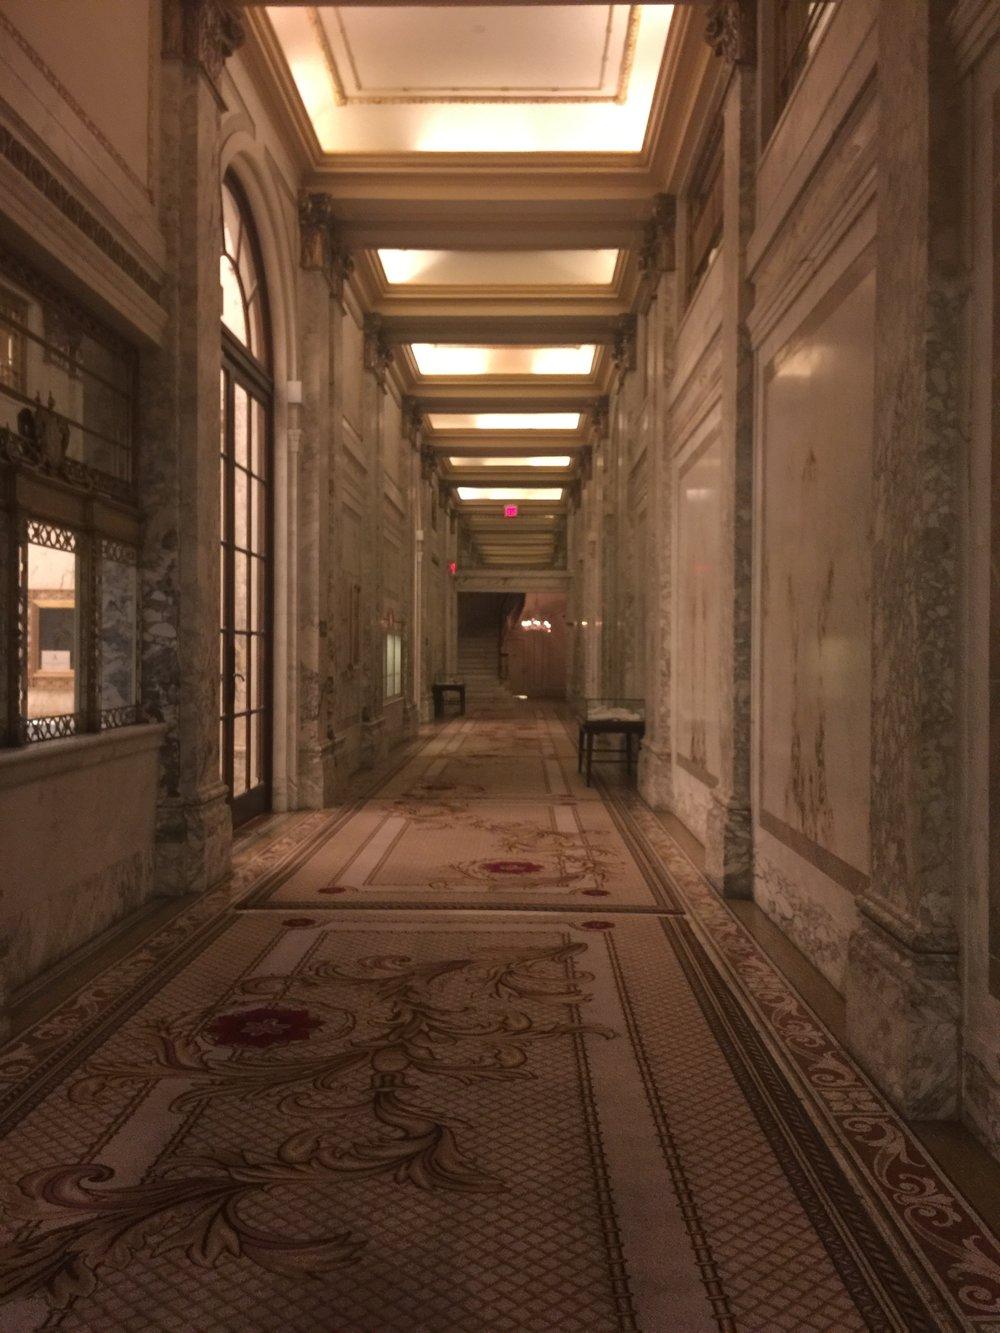 Inside The Plaza Hotel in NY